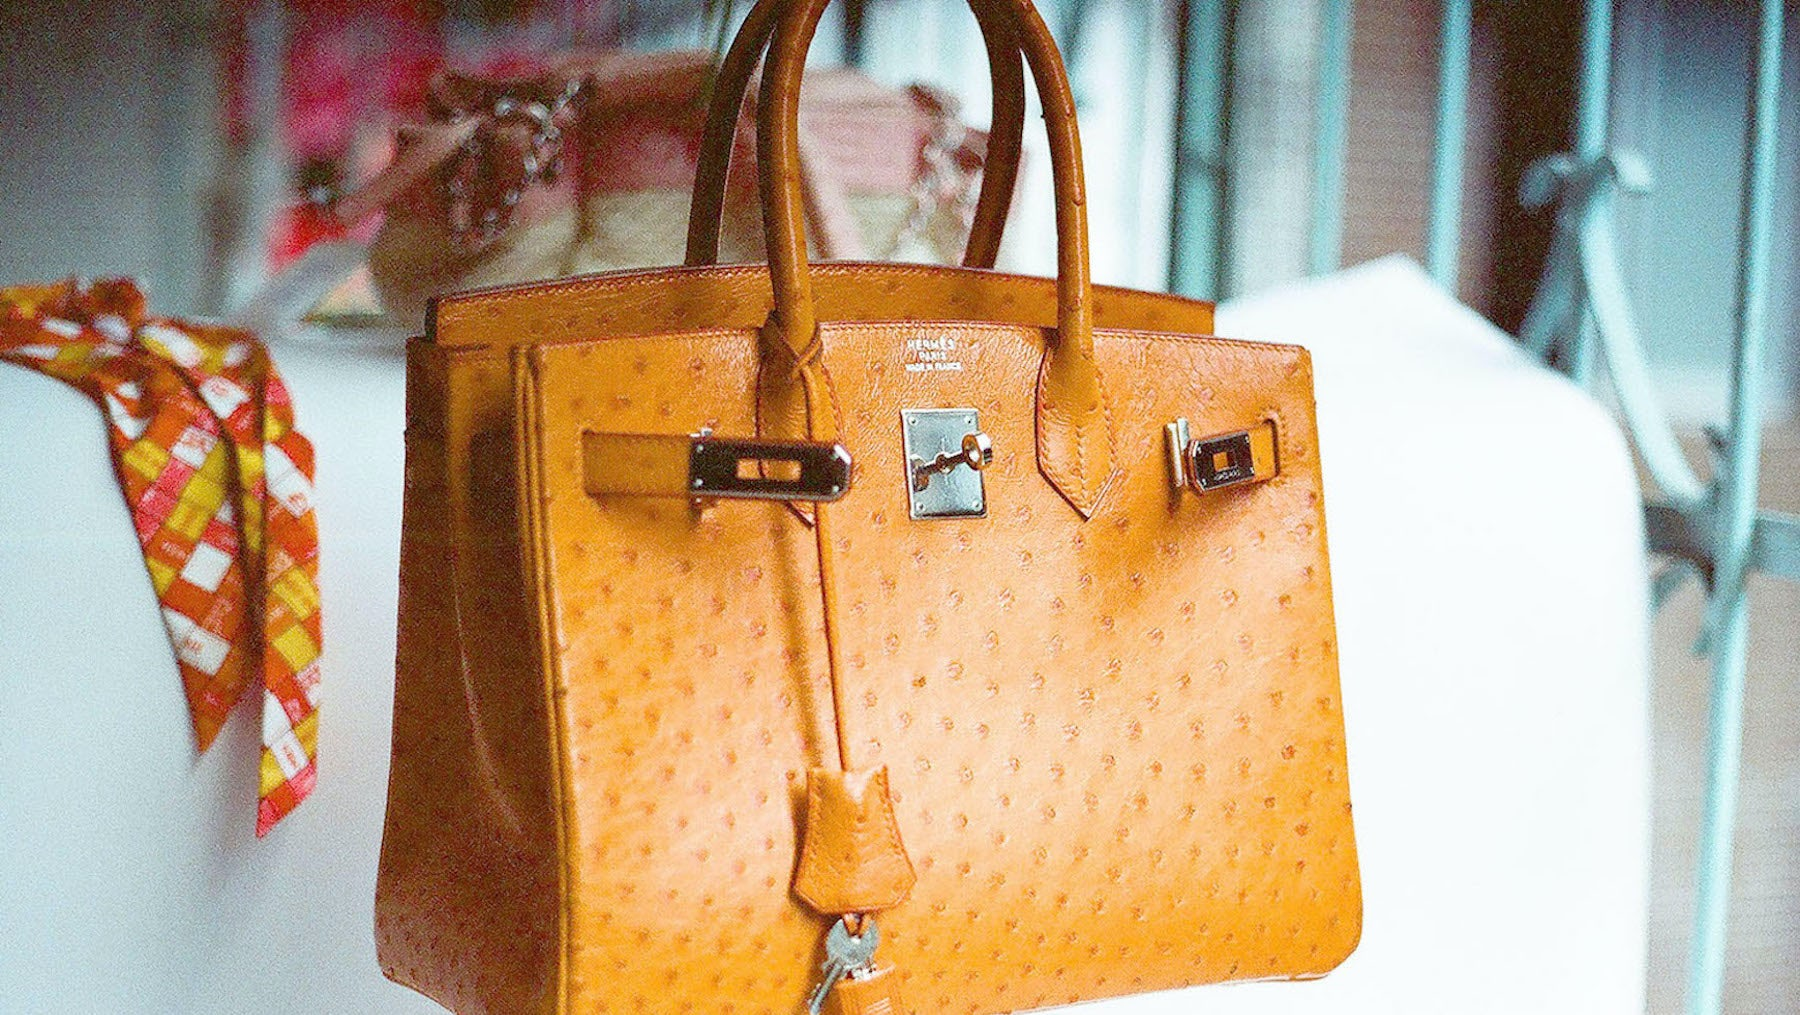 98567b039c clearance hermes birkin python gold diamond bag 18b8b 25b43  store hermès  birkin photo wen cheng liu flickr 8dad3 dd66b